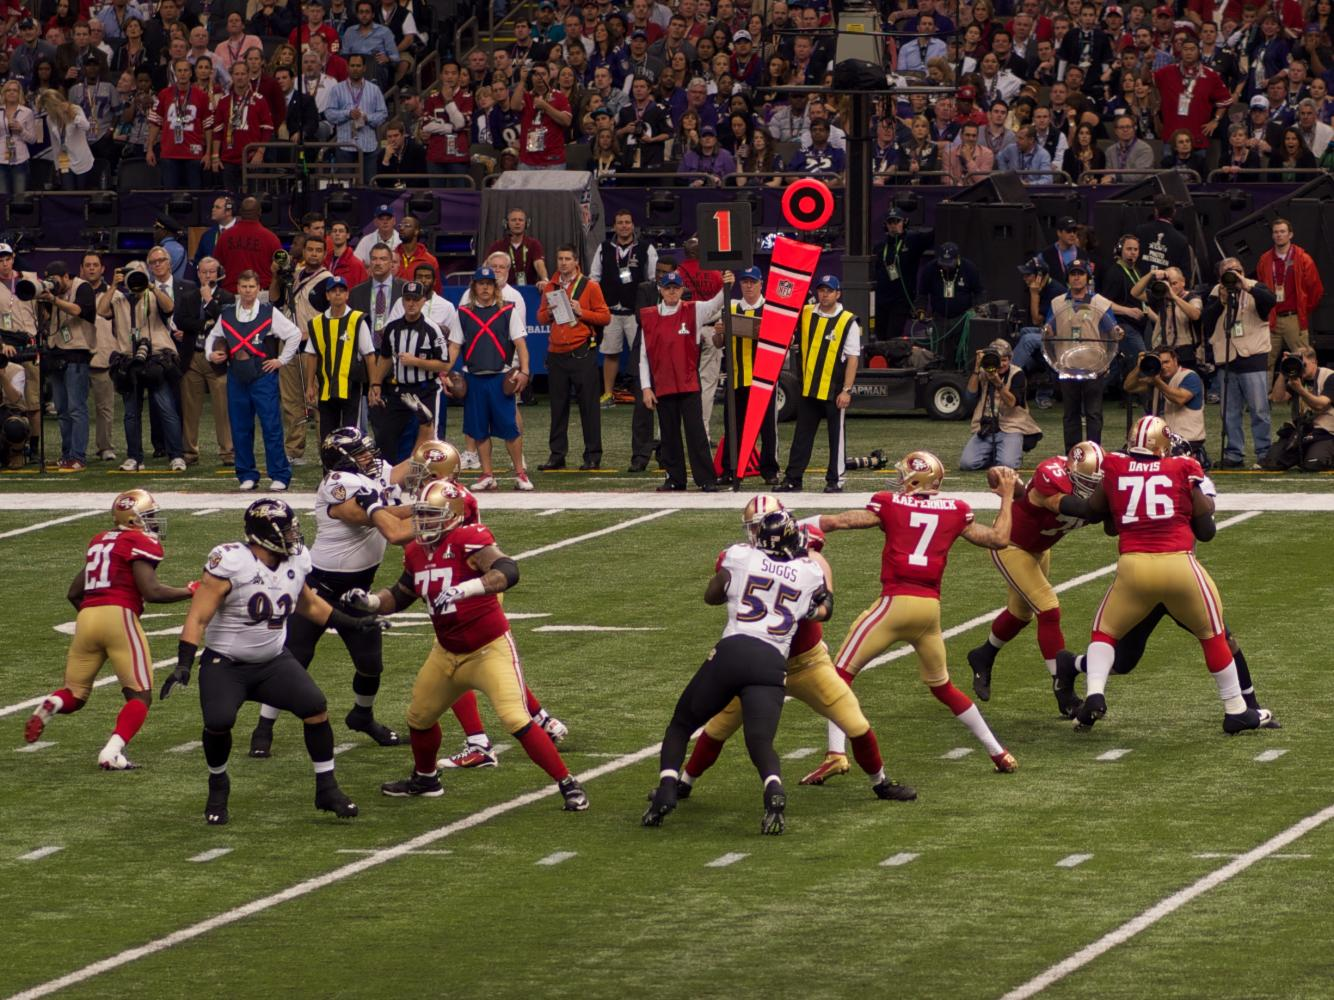 Colin Kaeperick (QB #7) plays in the  Super Bowl XLVII